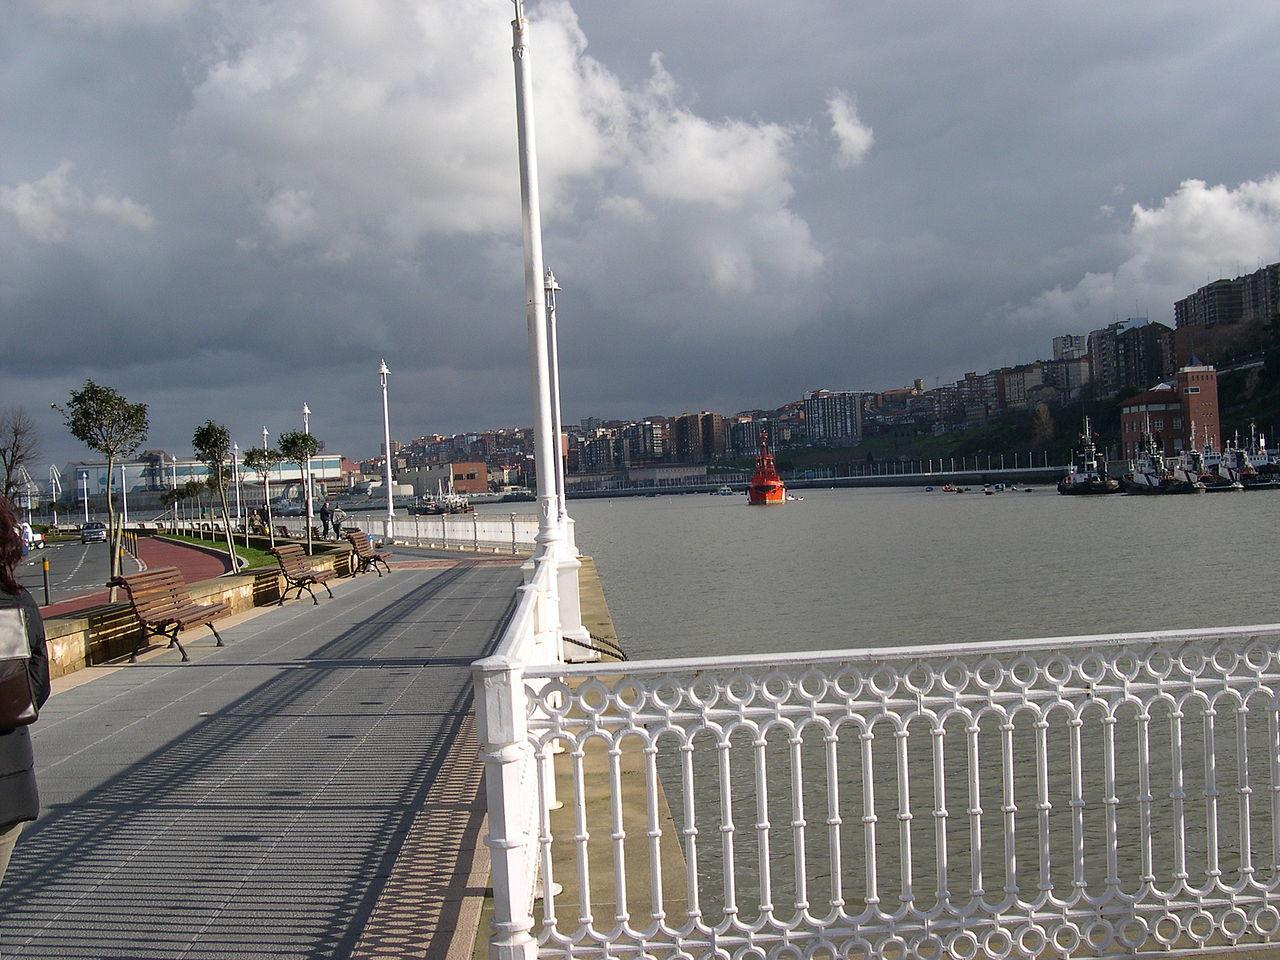 external image 1280px-Ibaizabal_River_Getxo.JPG